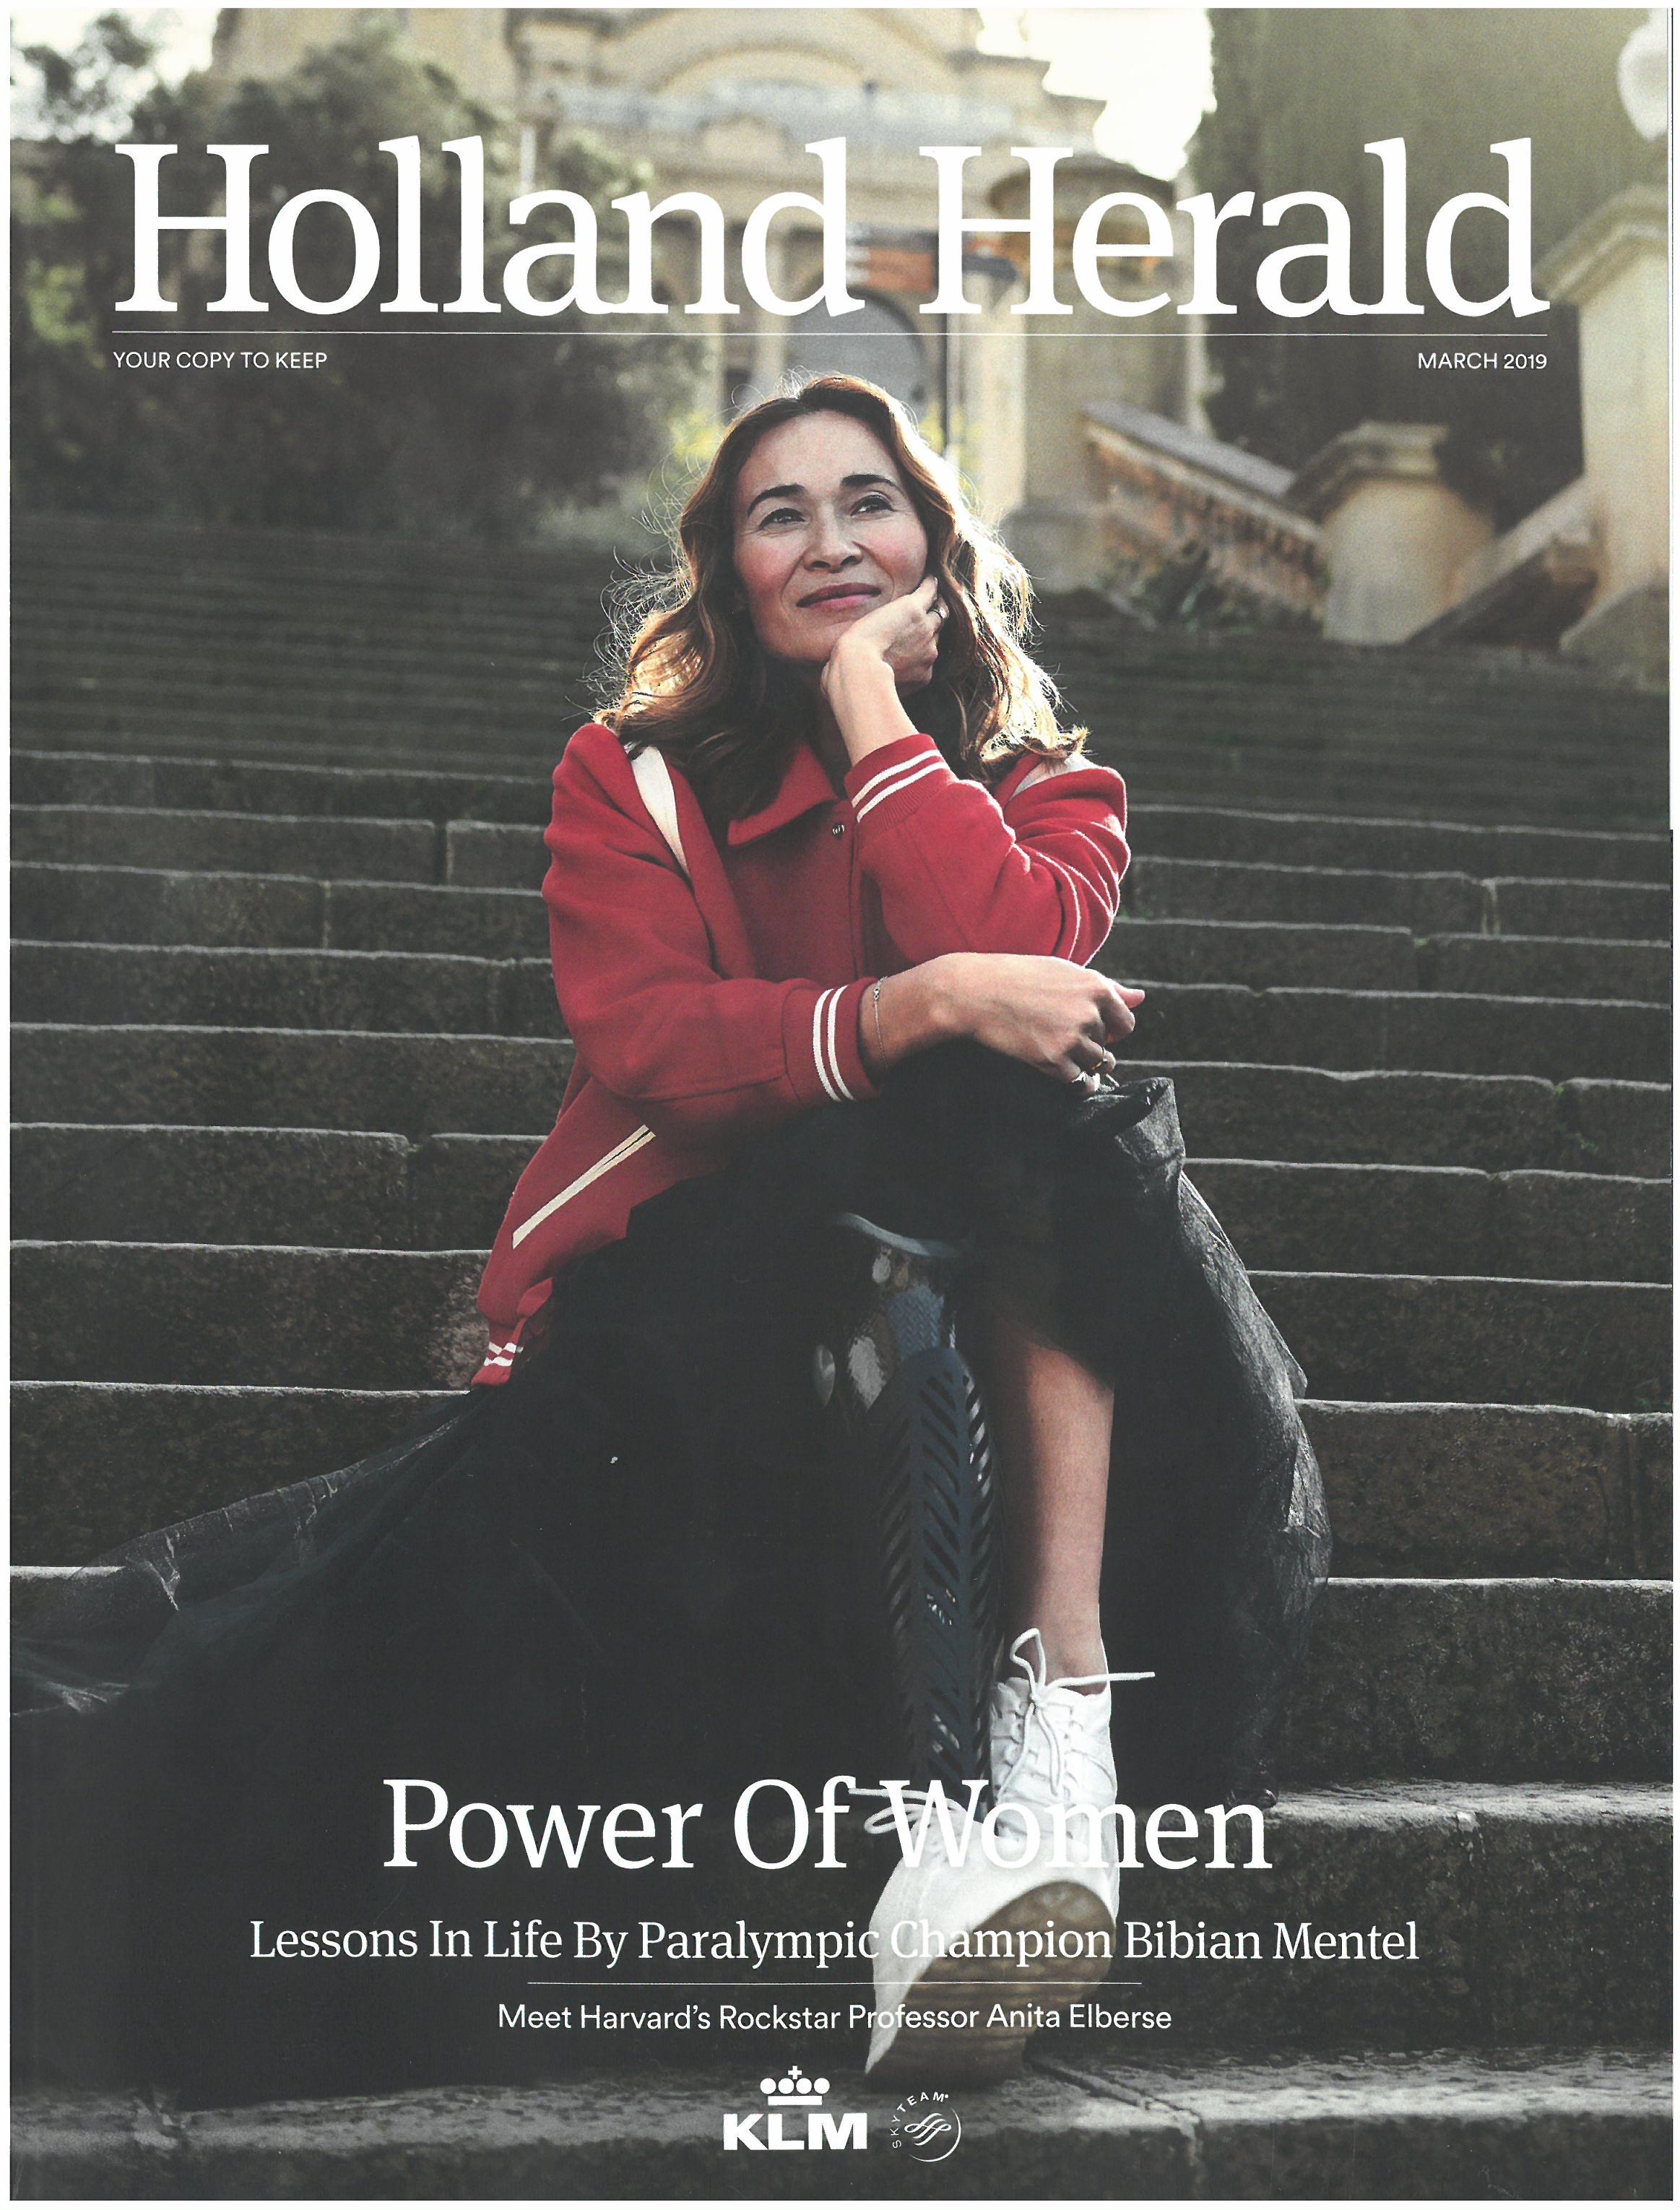 Holland-Herald_03-19.jpg